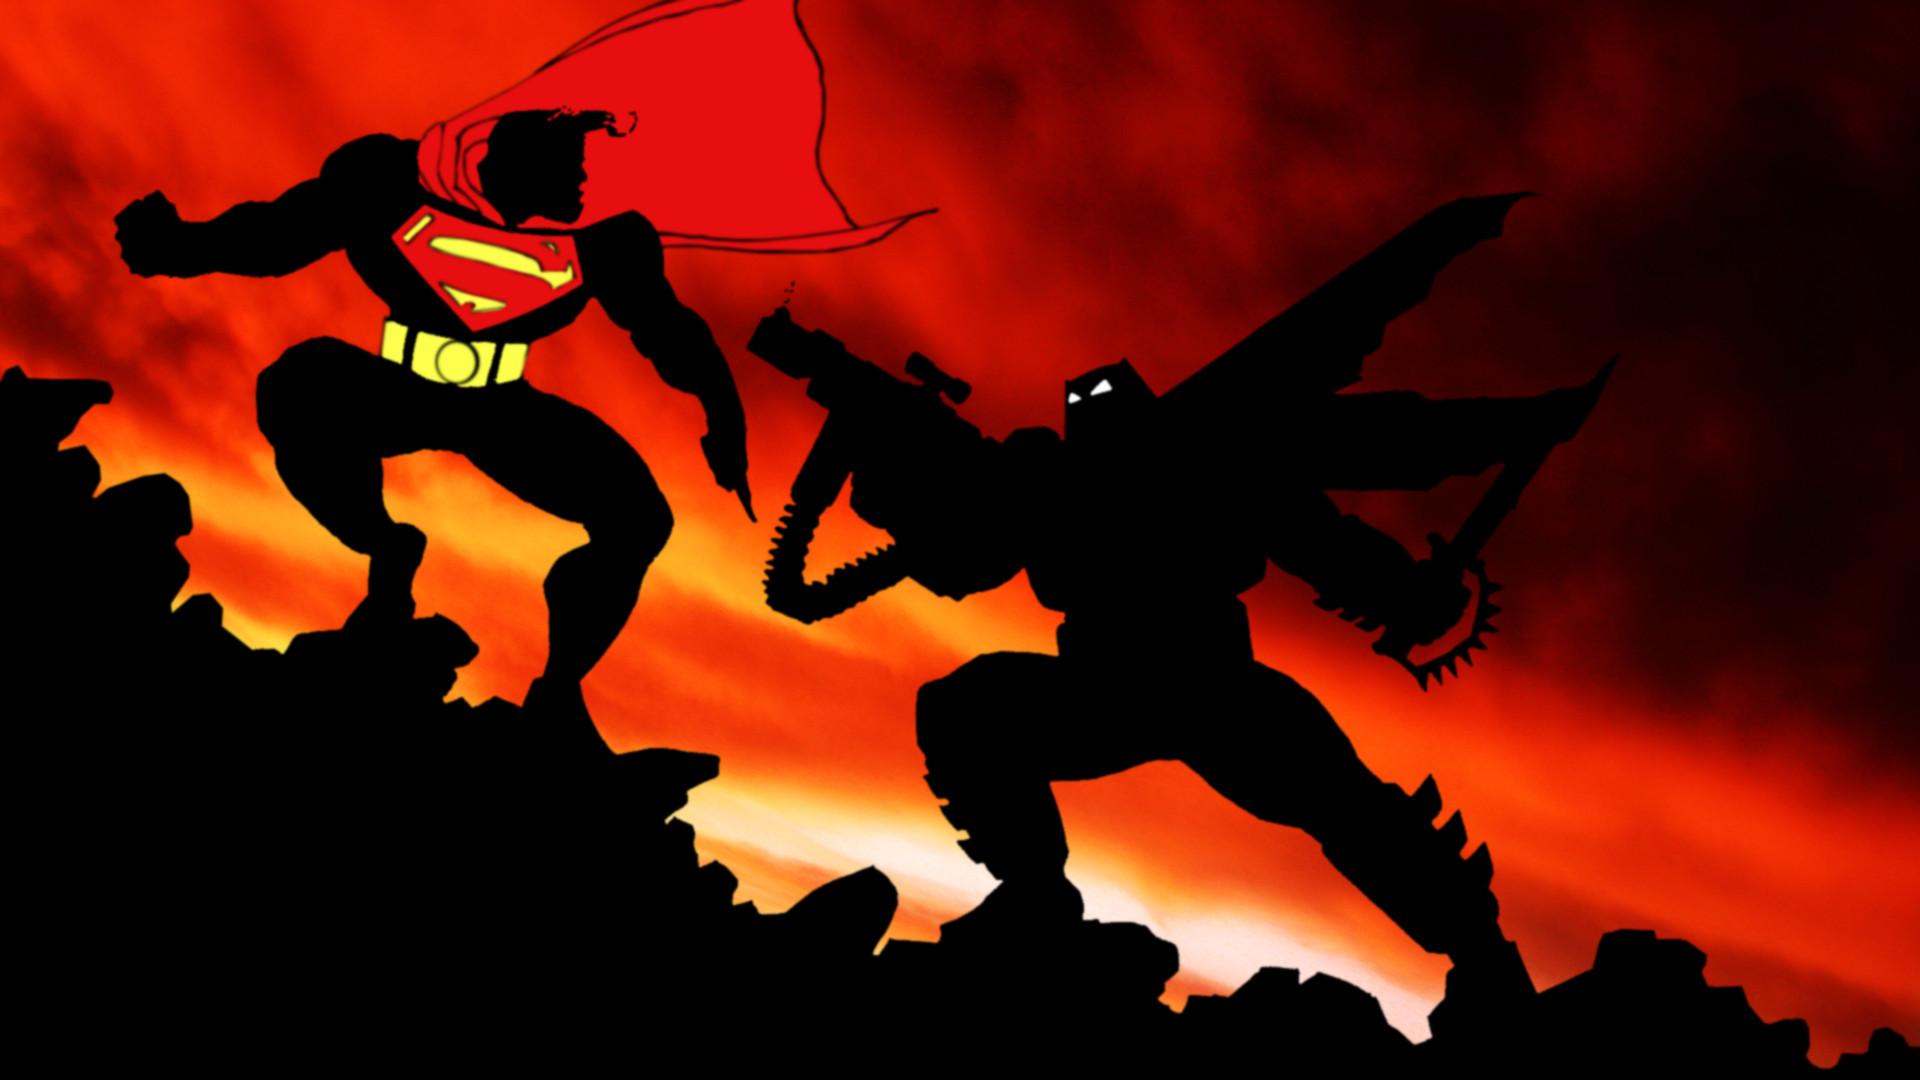 Batman The Dark Knight Returns Hd Wallpaper Background Image